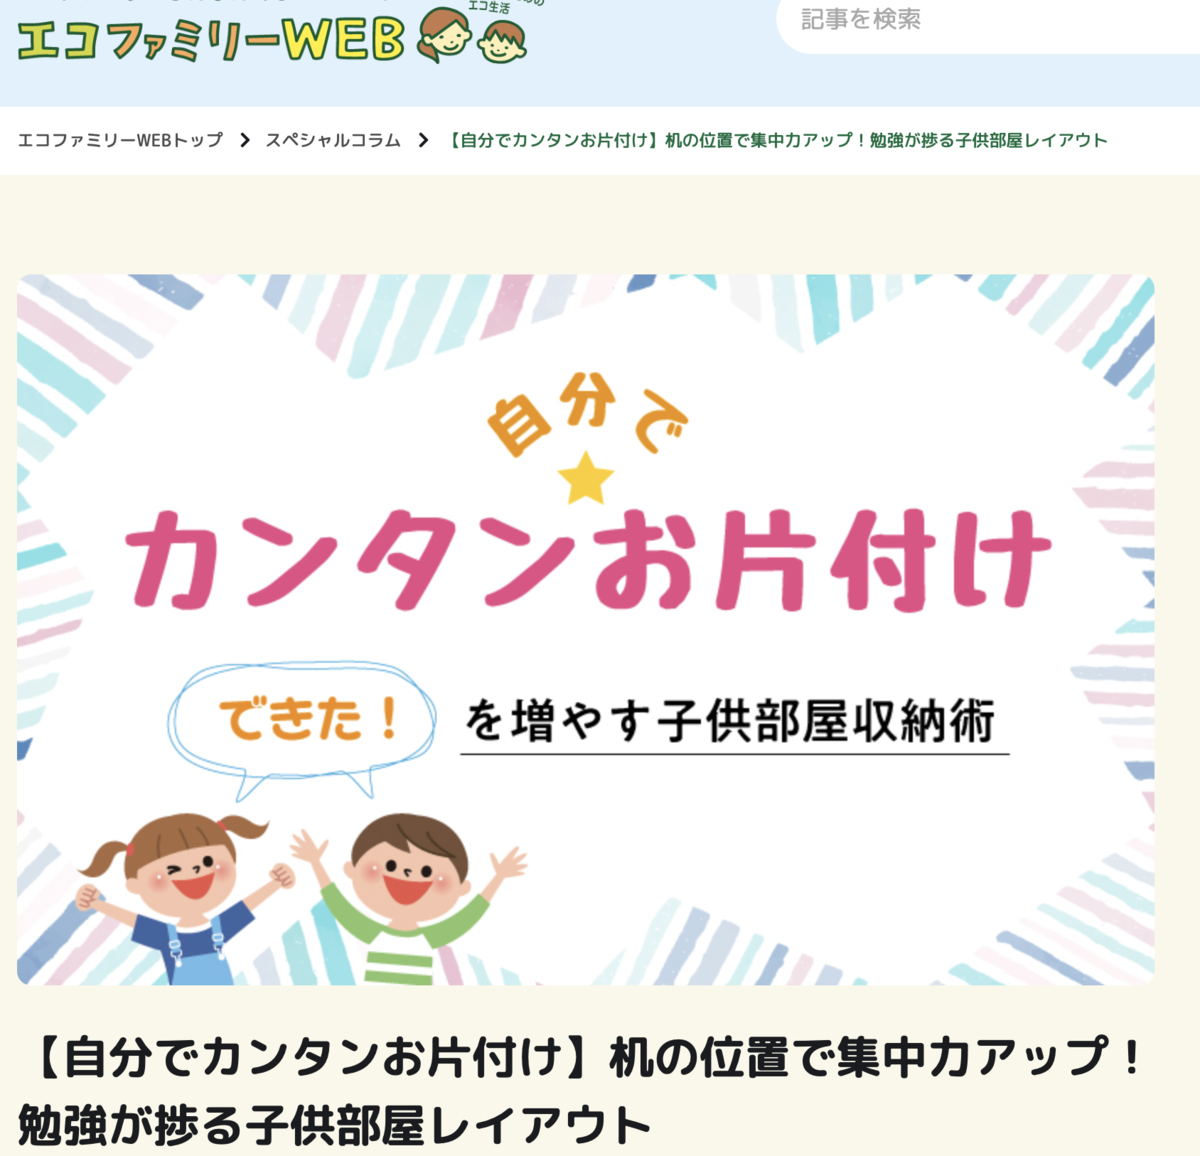 f:id:karumako8564:20210604151854p:plain